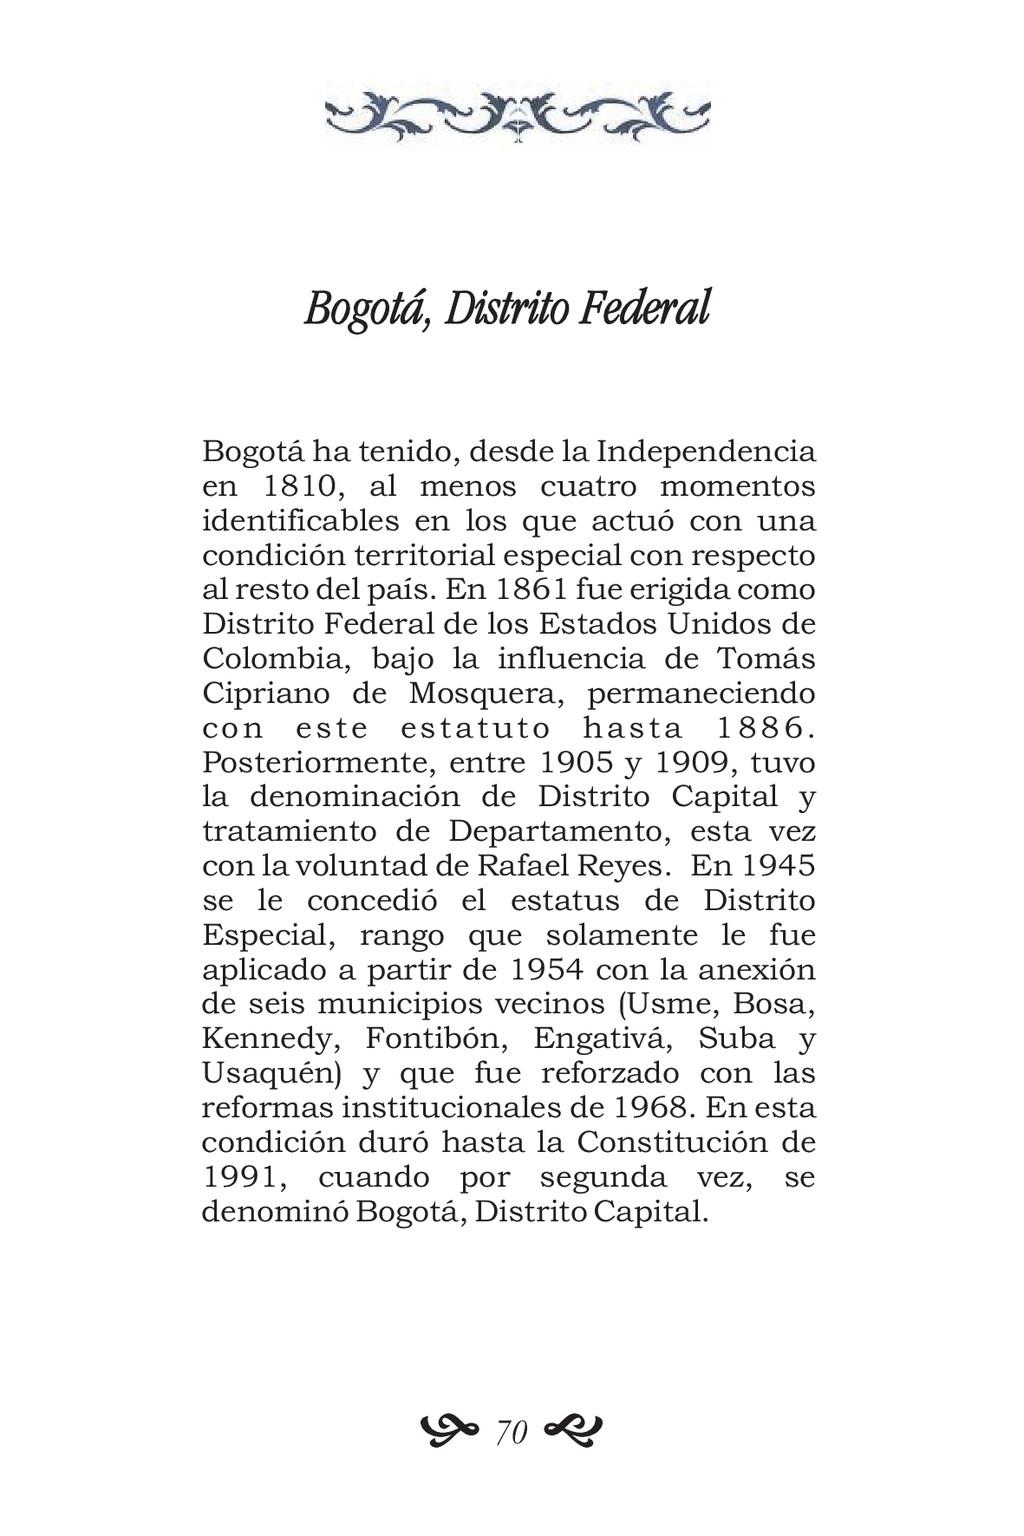 Bogotá, Distrito Federal Bogotá ha tenido, desd...